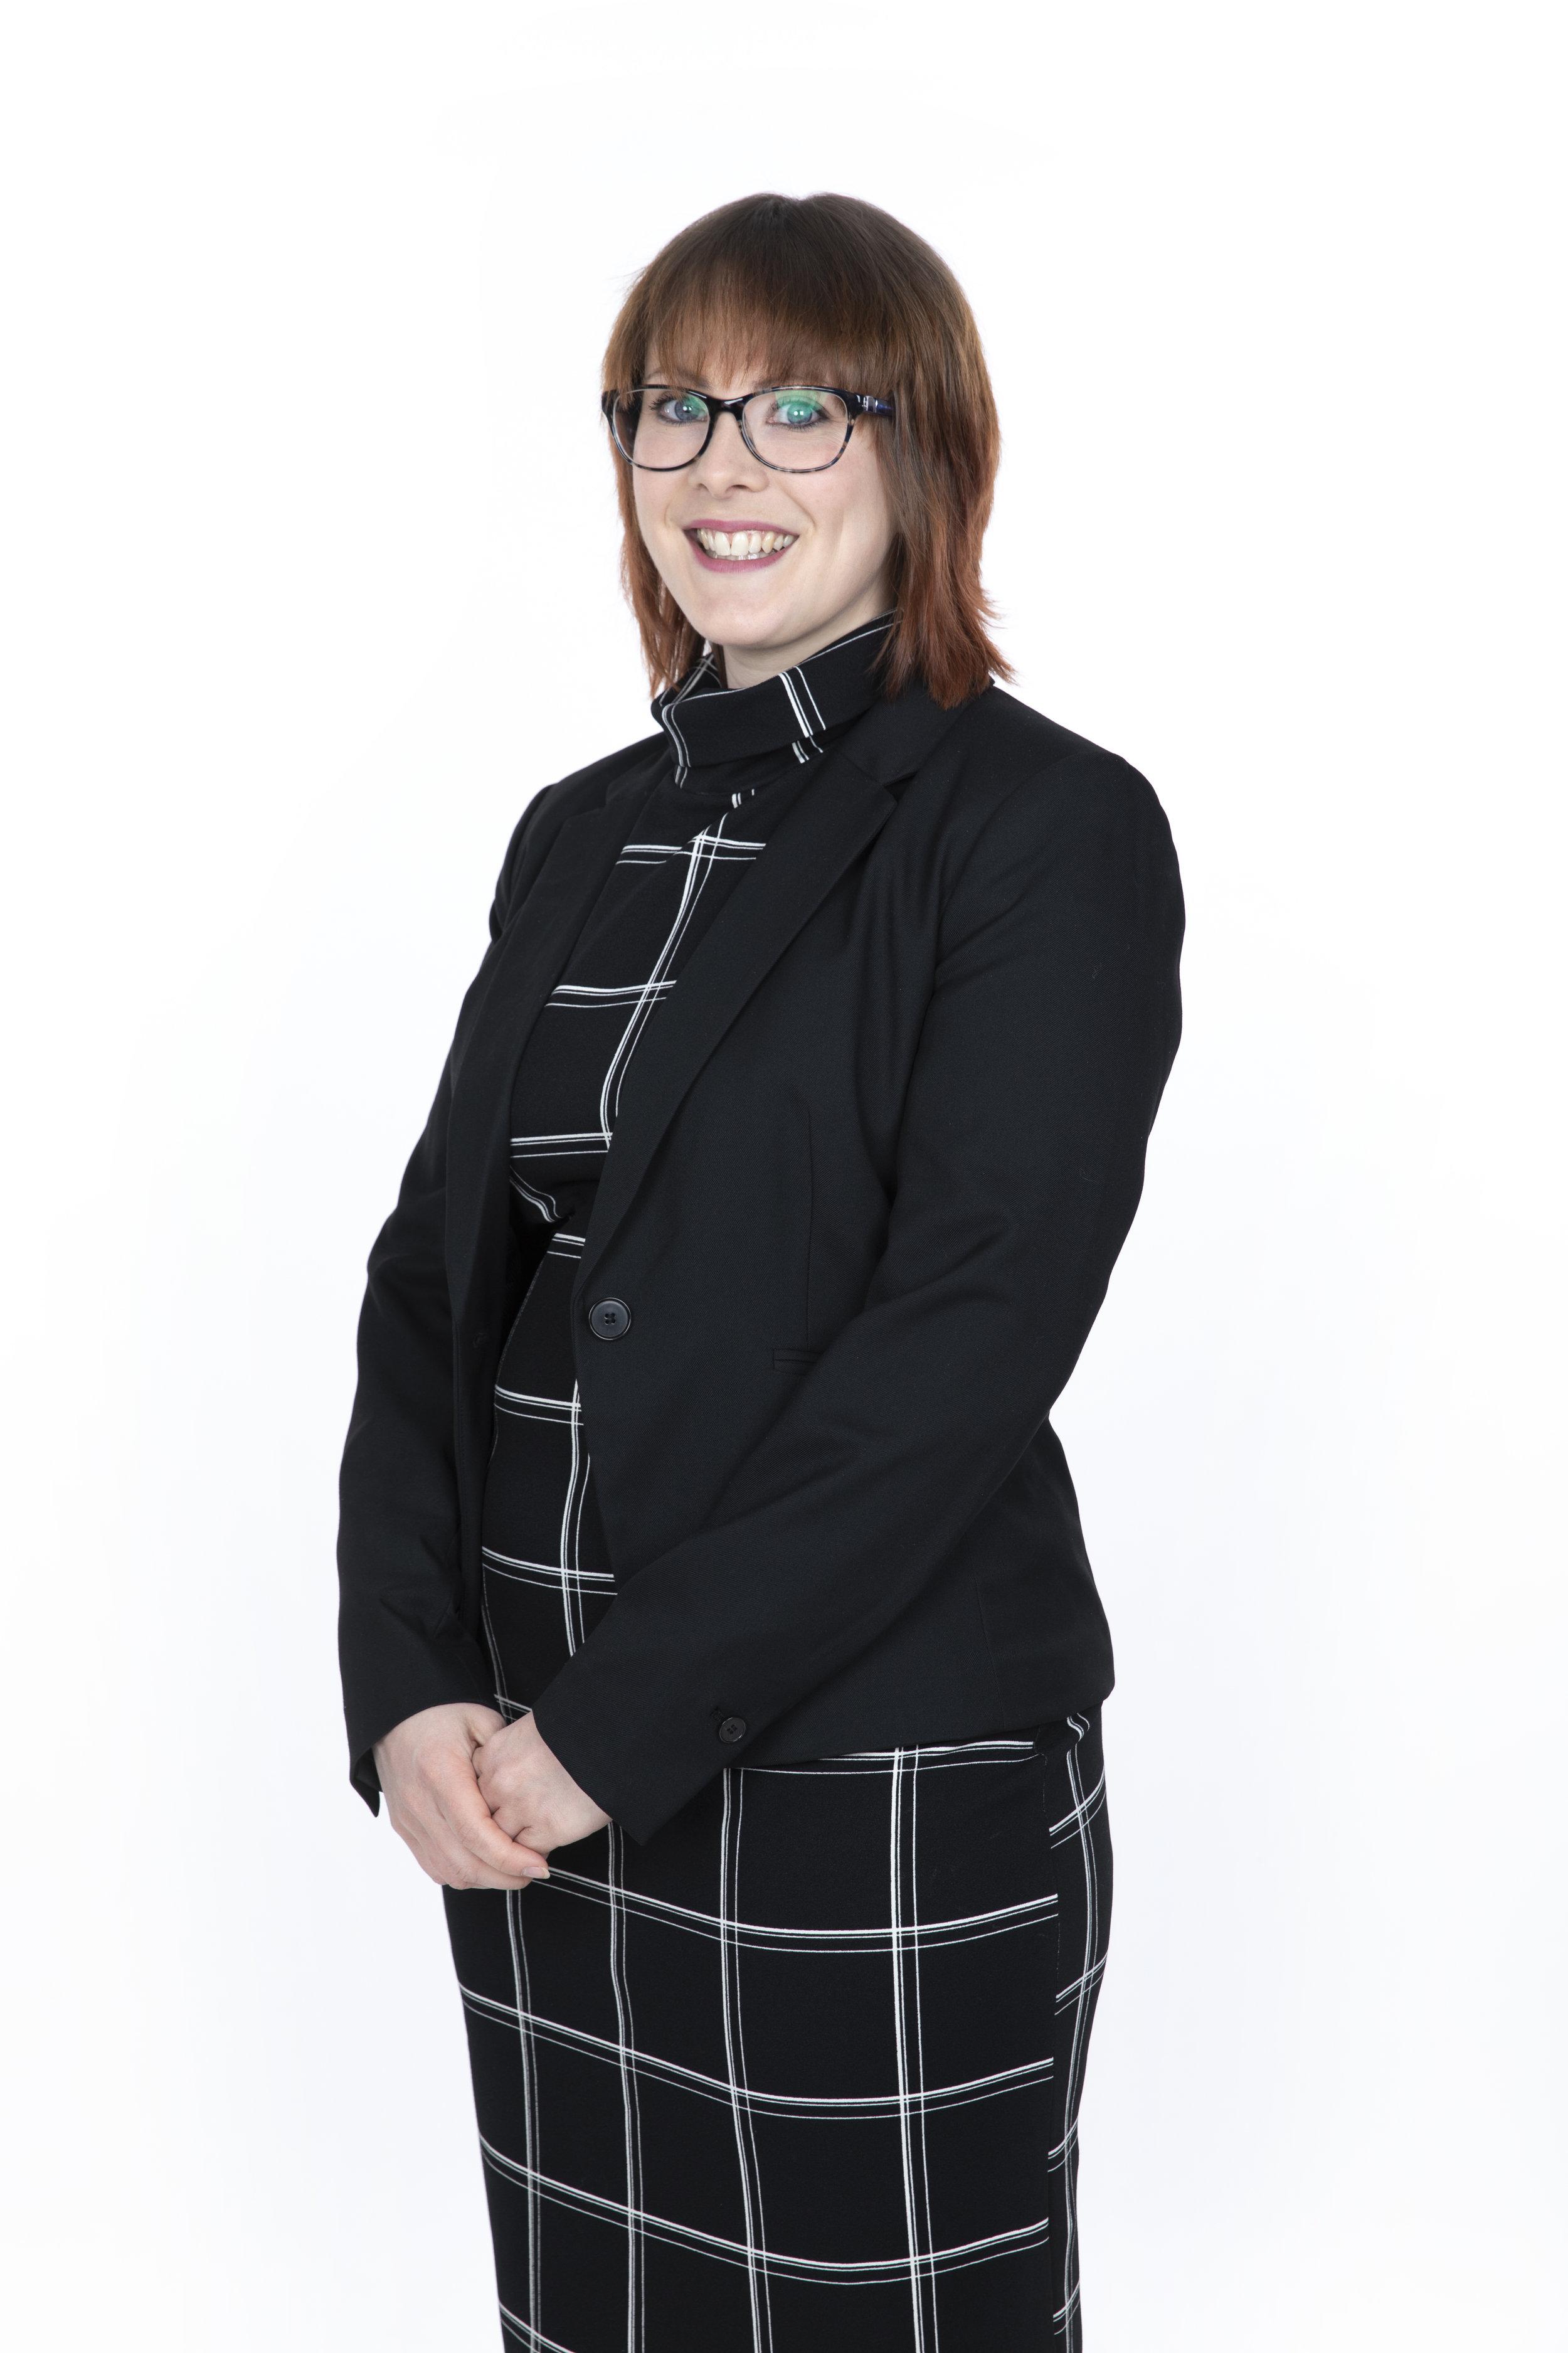 Natalie Fitzhugh - Trainee Solicitor